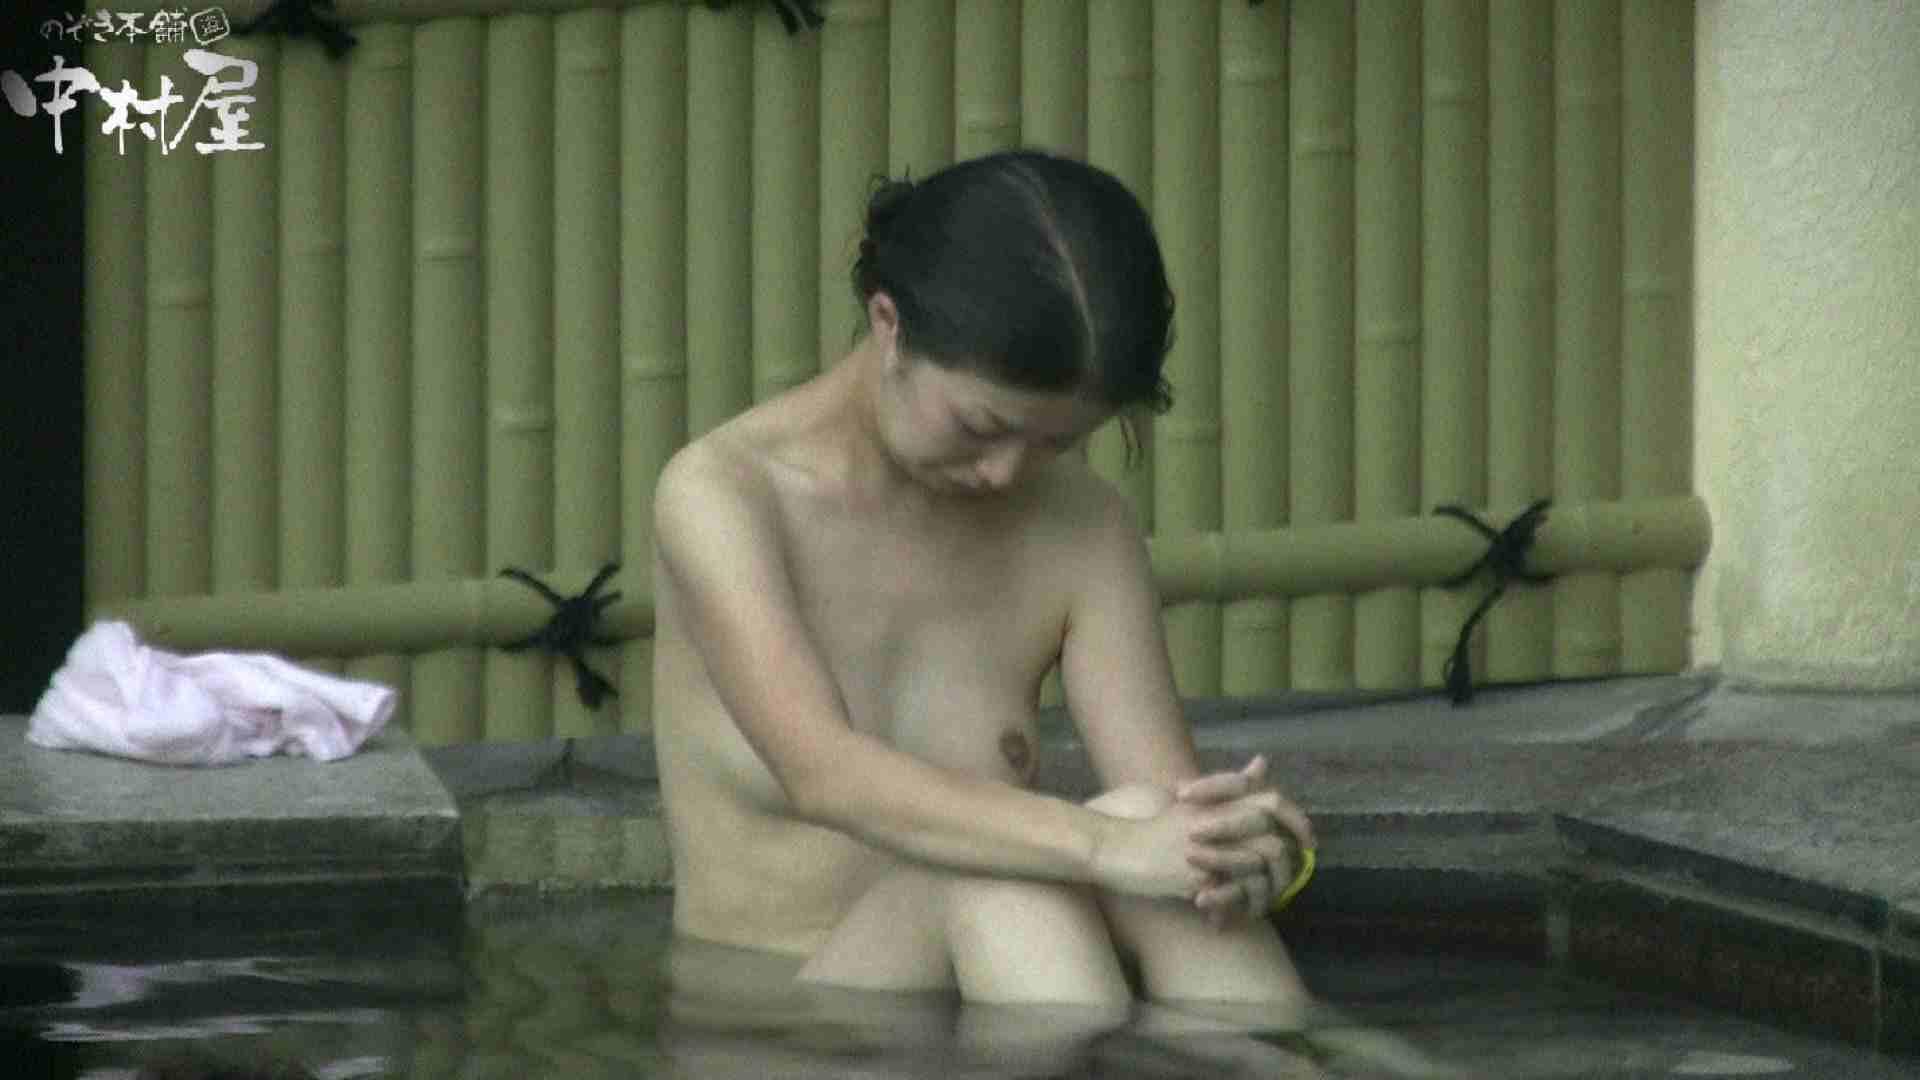 Aquaな露天風呂Vol.904 美しいOLの裸体 オメコ動画キャプチャ 103pic 80